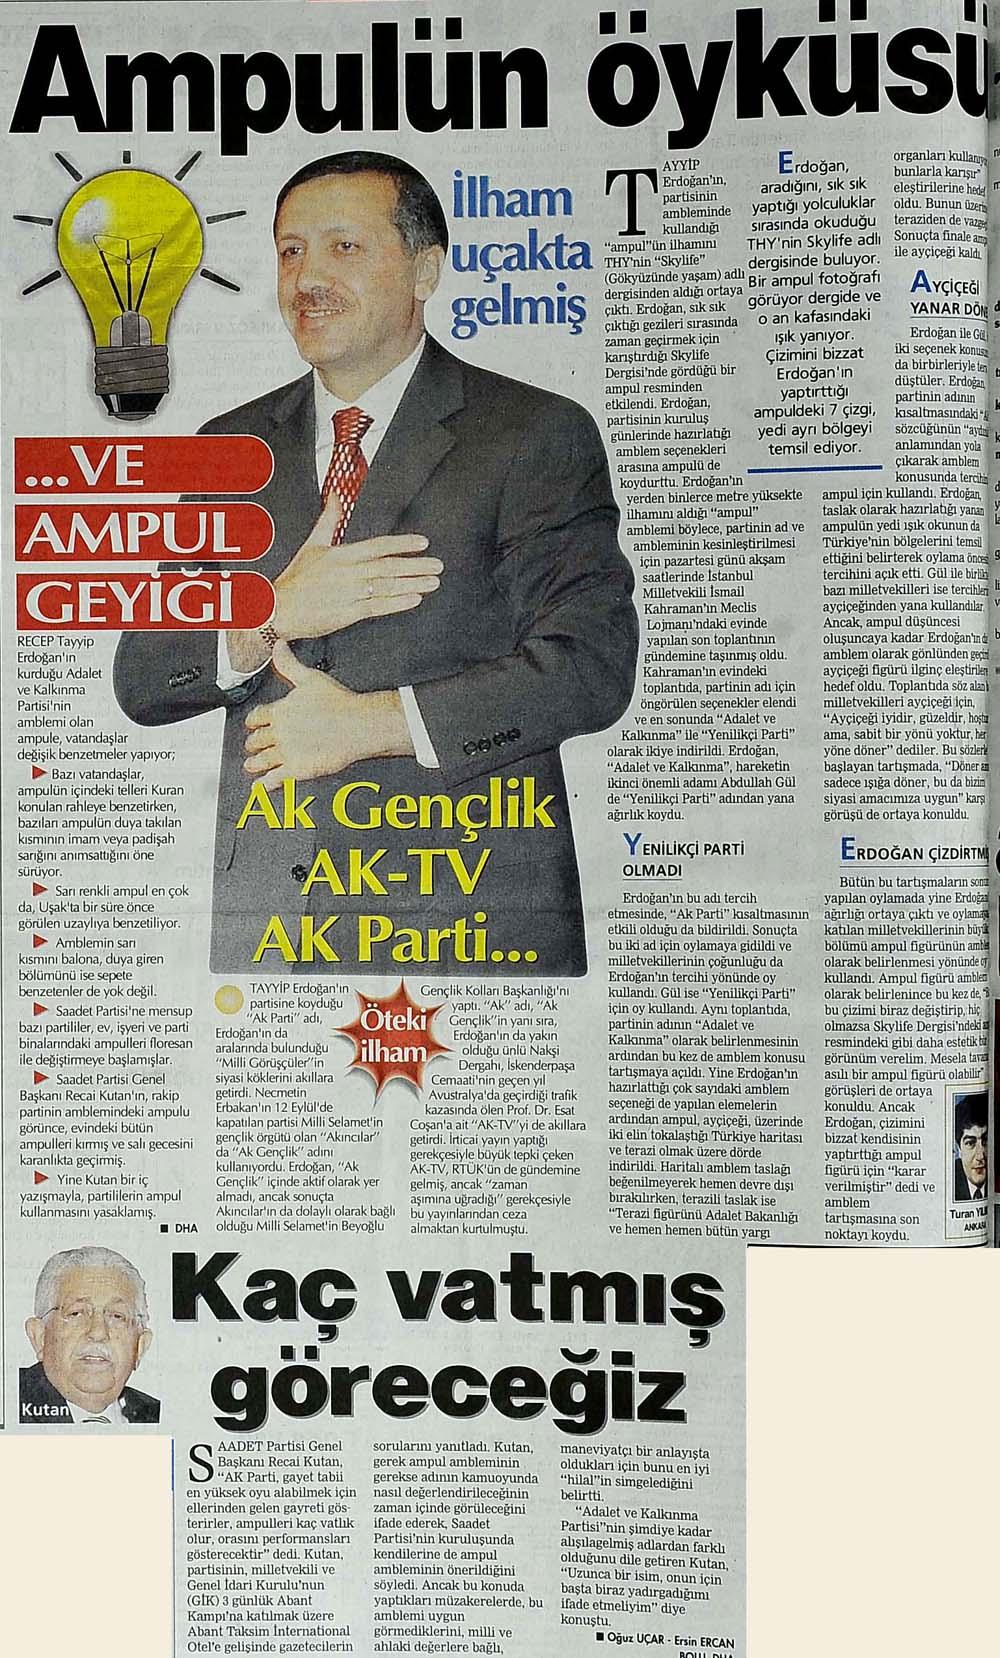 Ampulün öyküsü